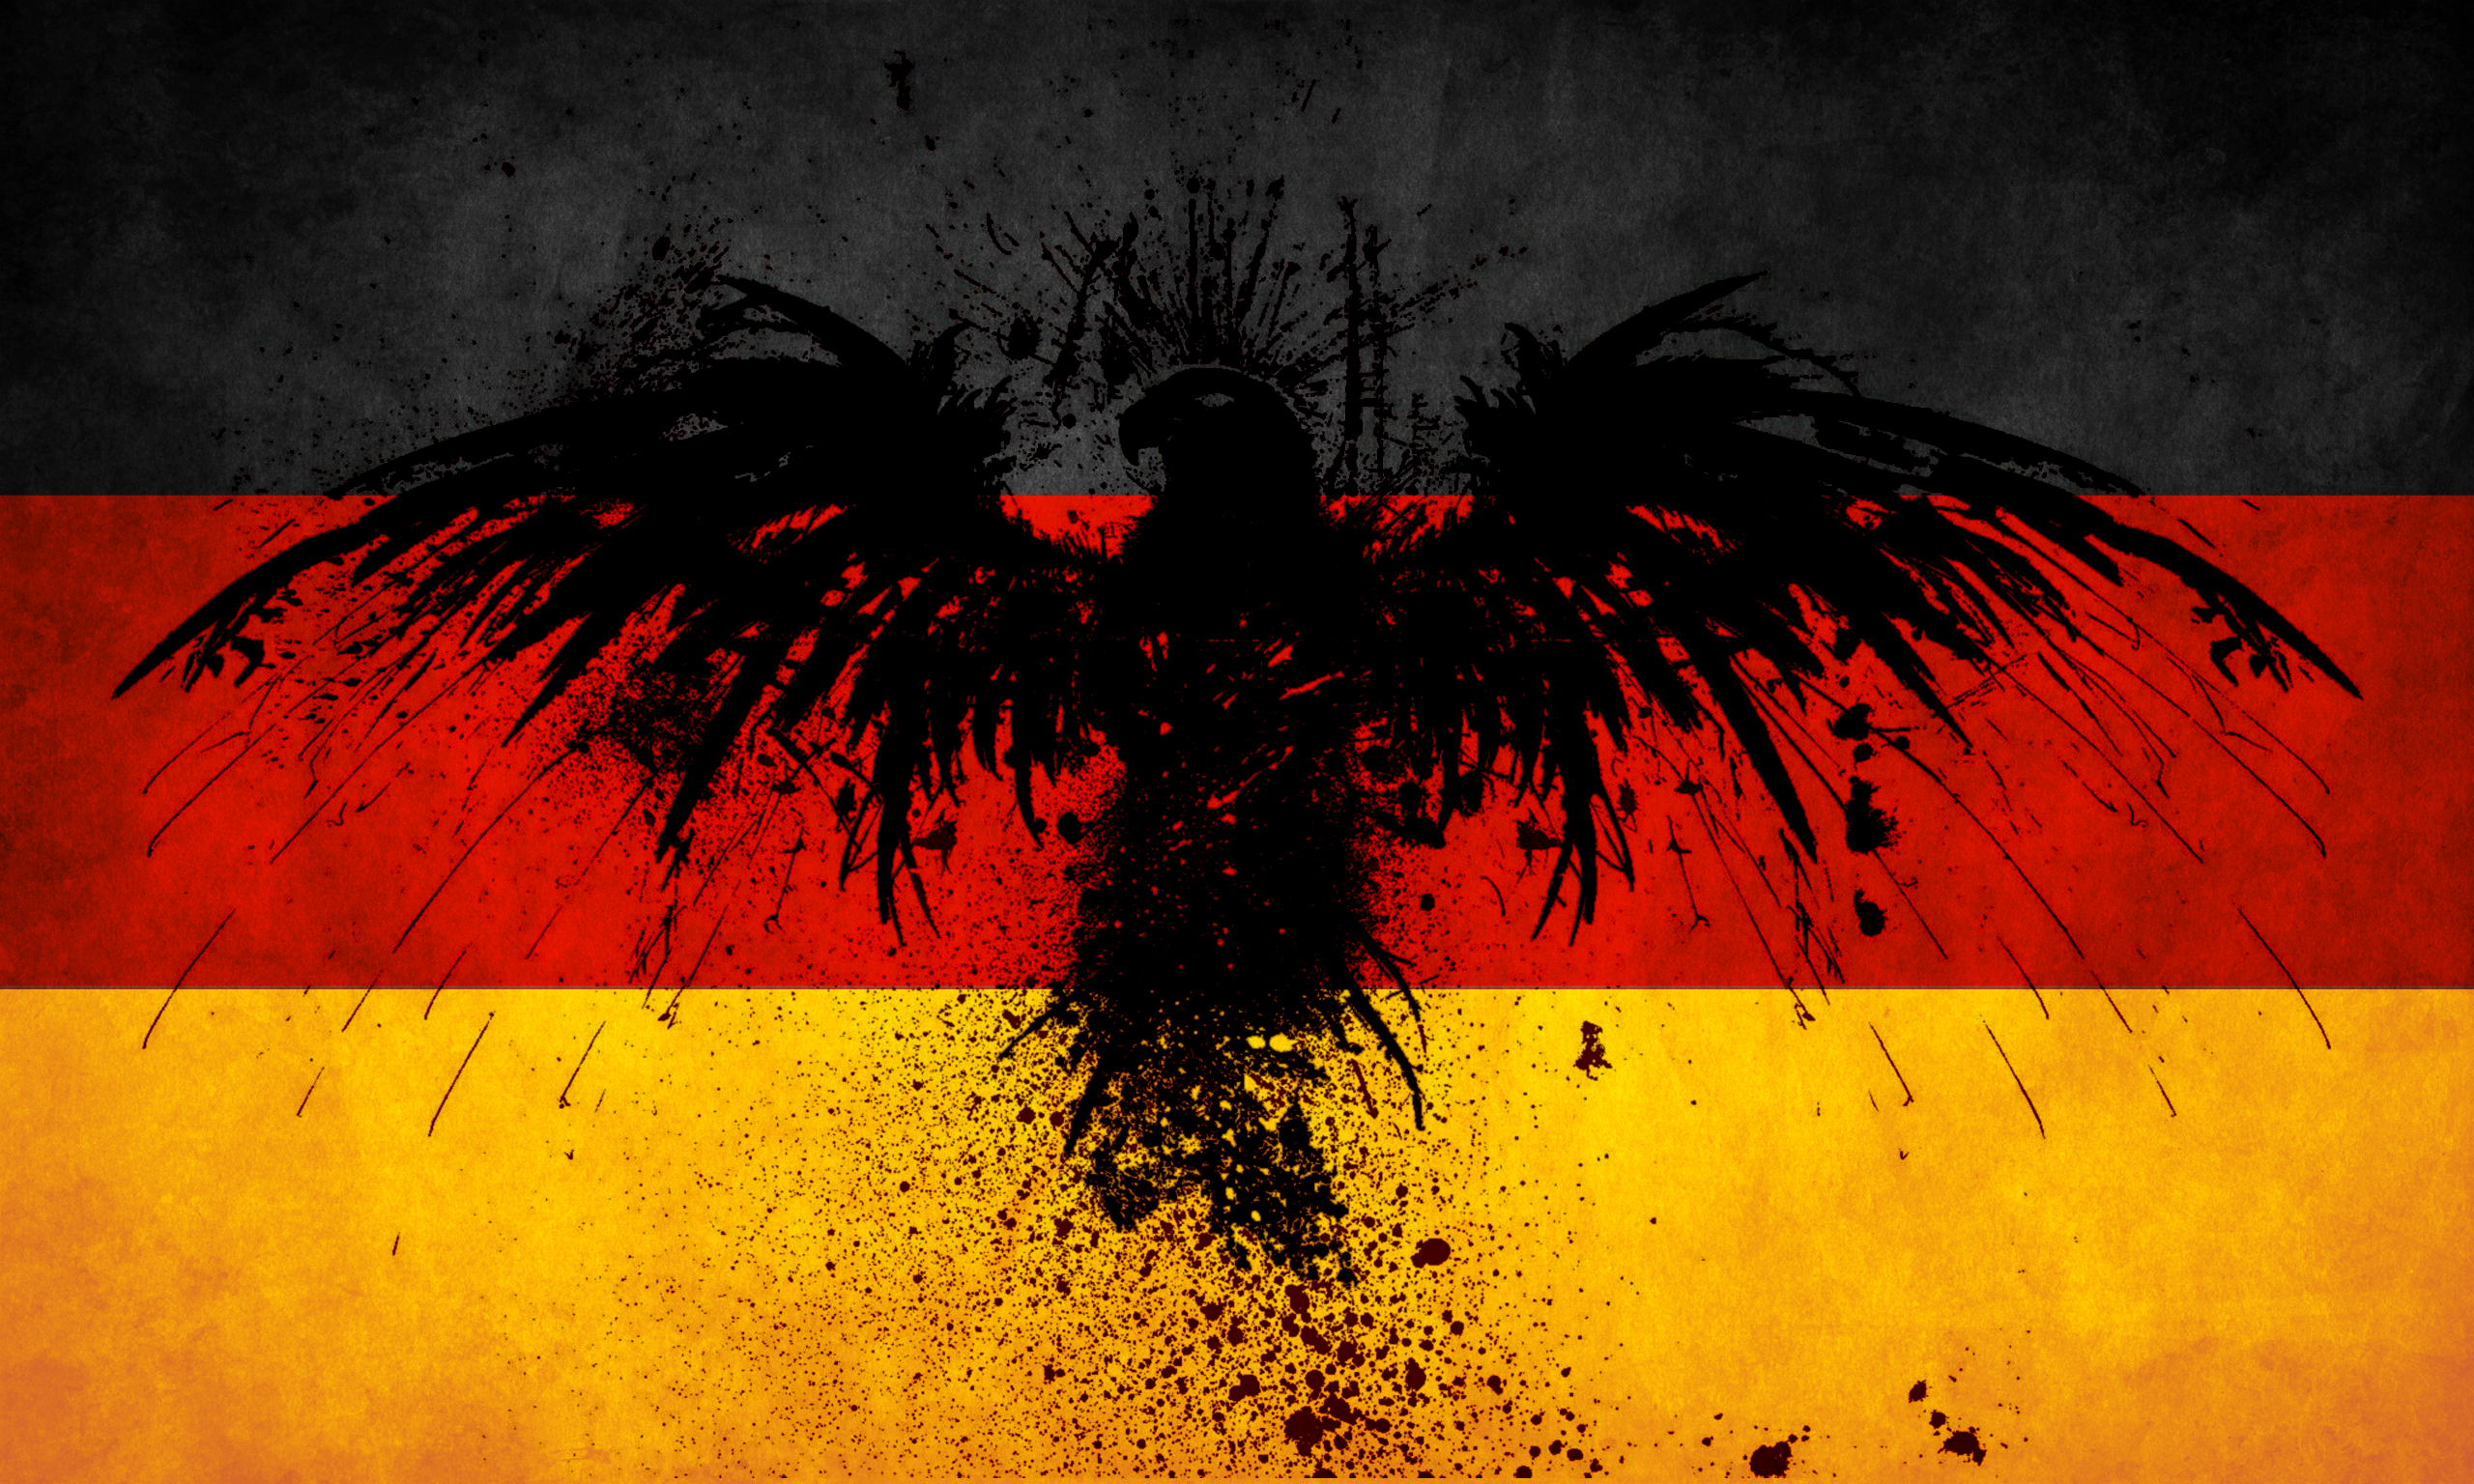 Germany flag art wallpaper High Quality WallpapersWallpaper Desktop 2560x1536